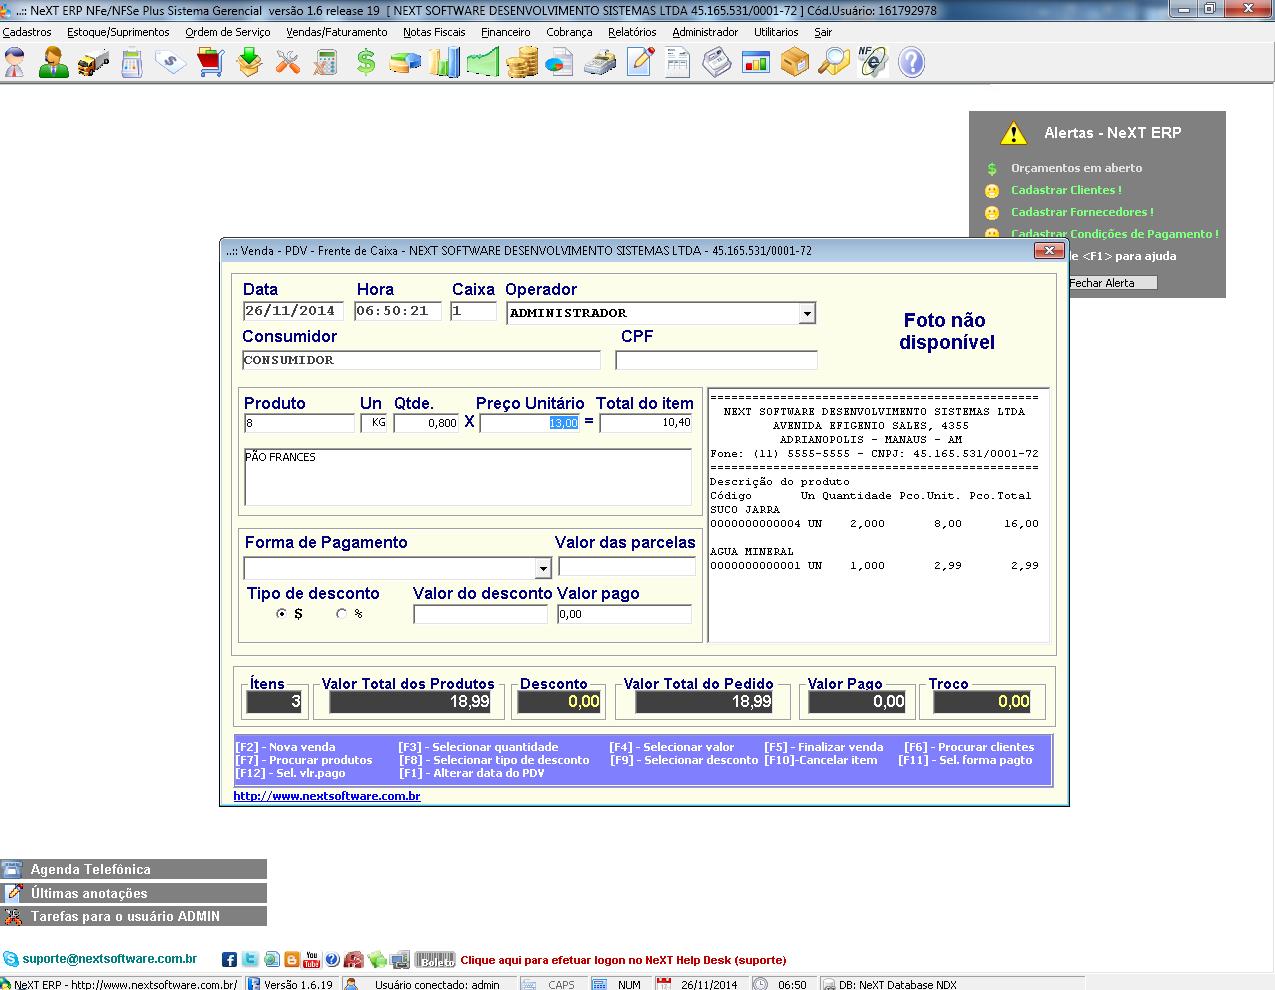 NFC-e Nota Fiscal Eletrônica ao Consumidor NeXT ERP